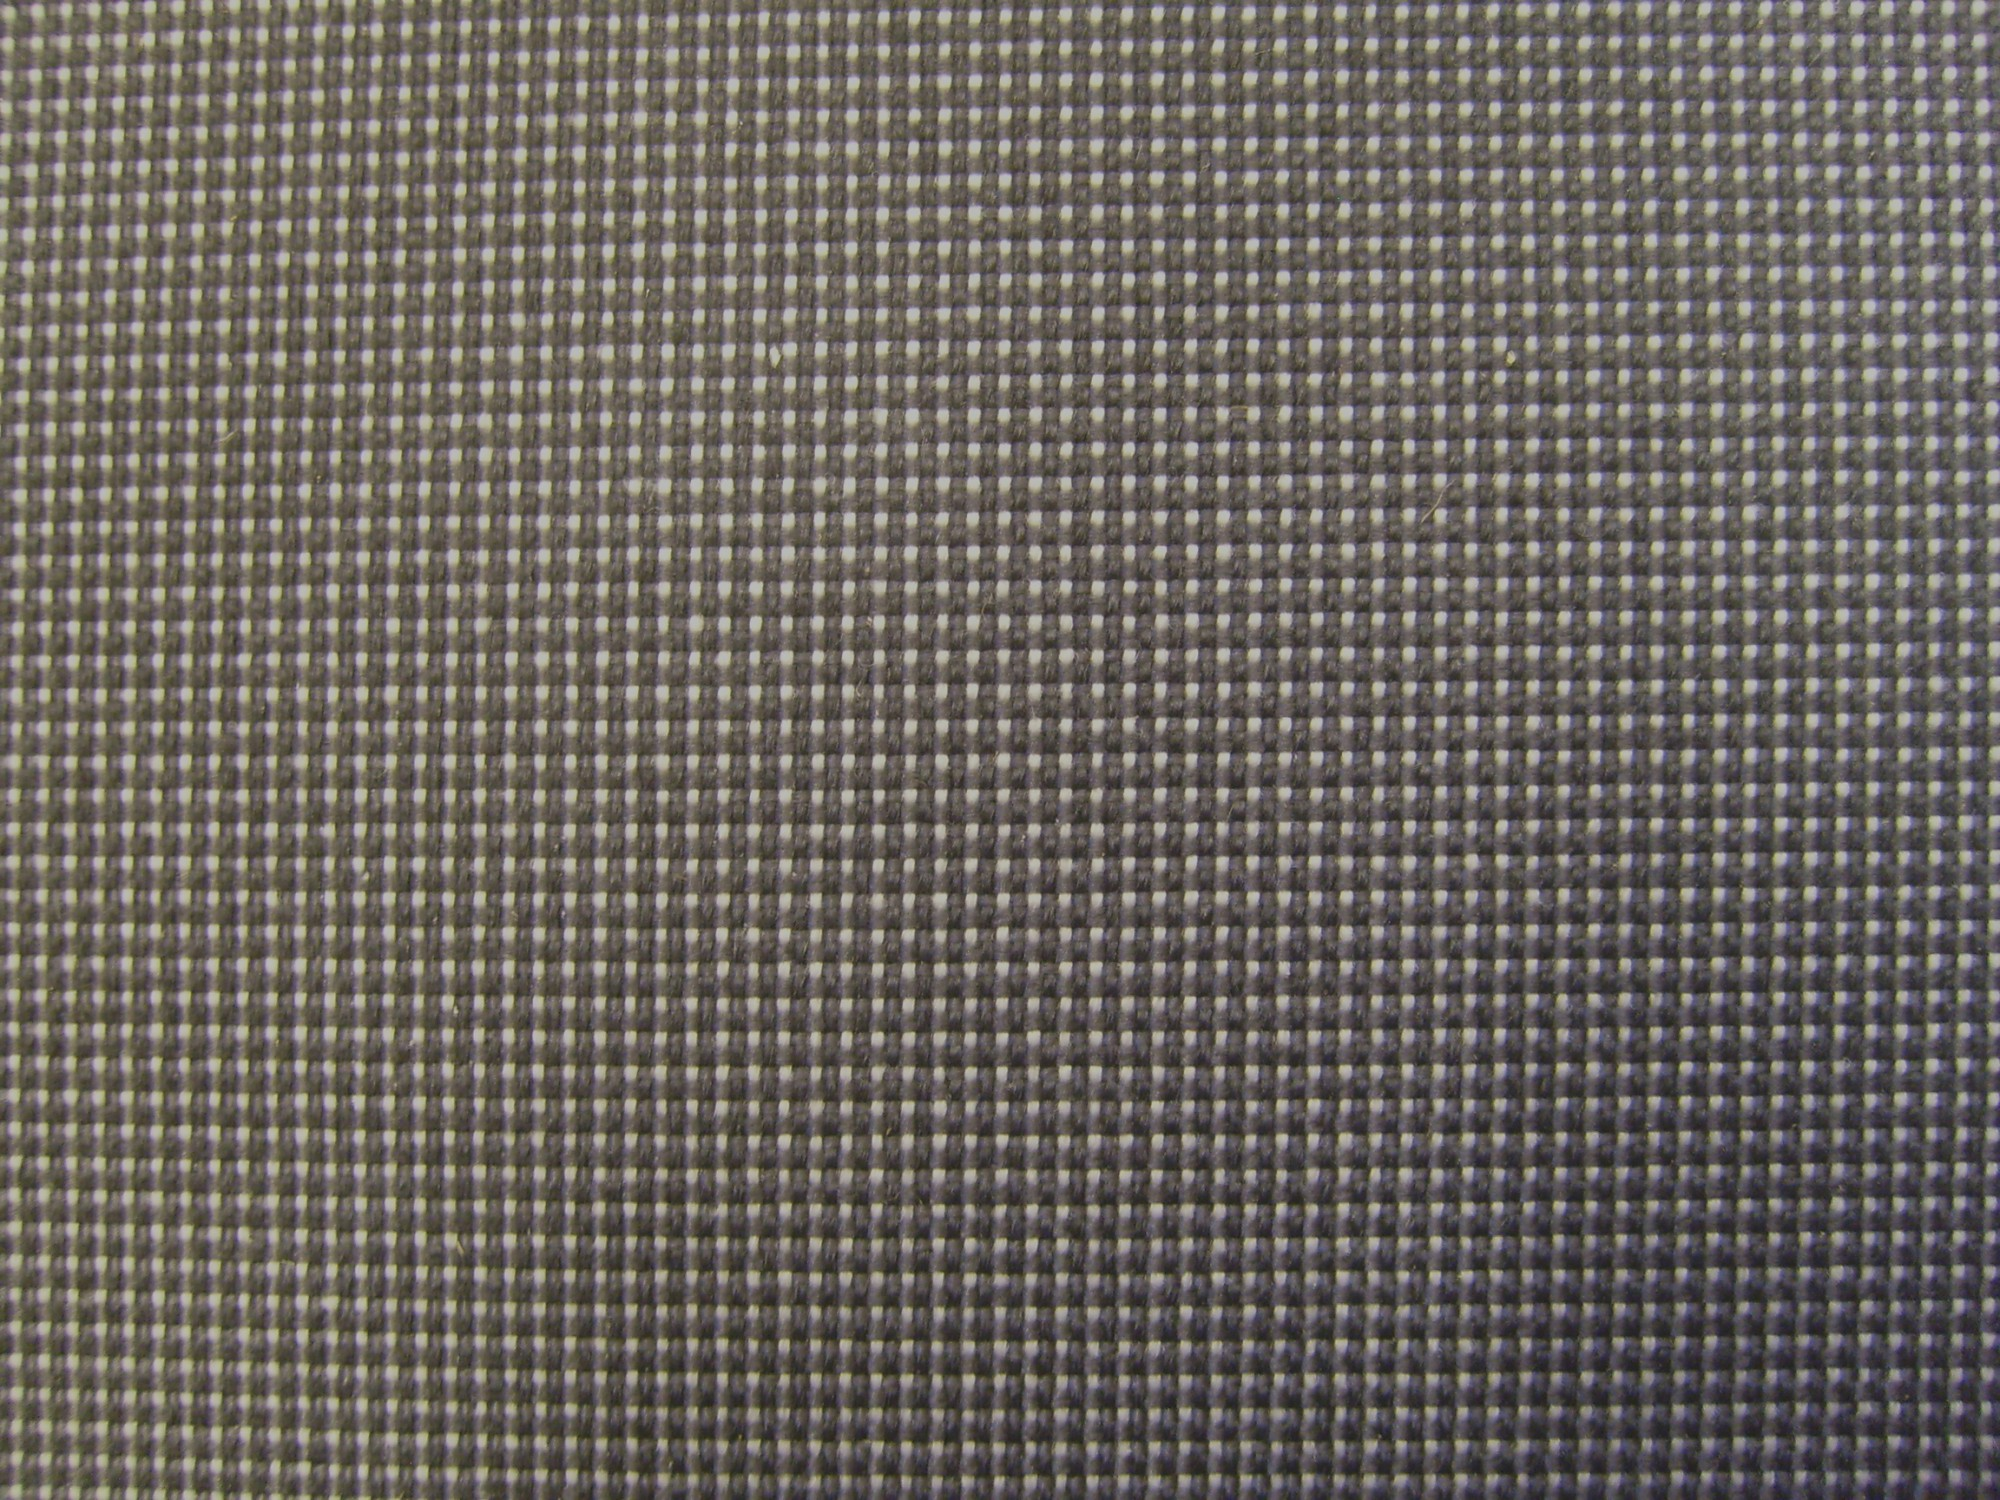 Vw T5 Austin Fabric Perfect F1299 Fabric Segal Motor Trimmings Ltd